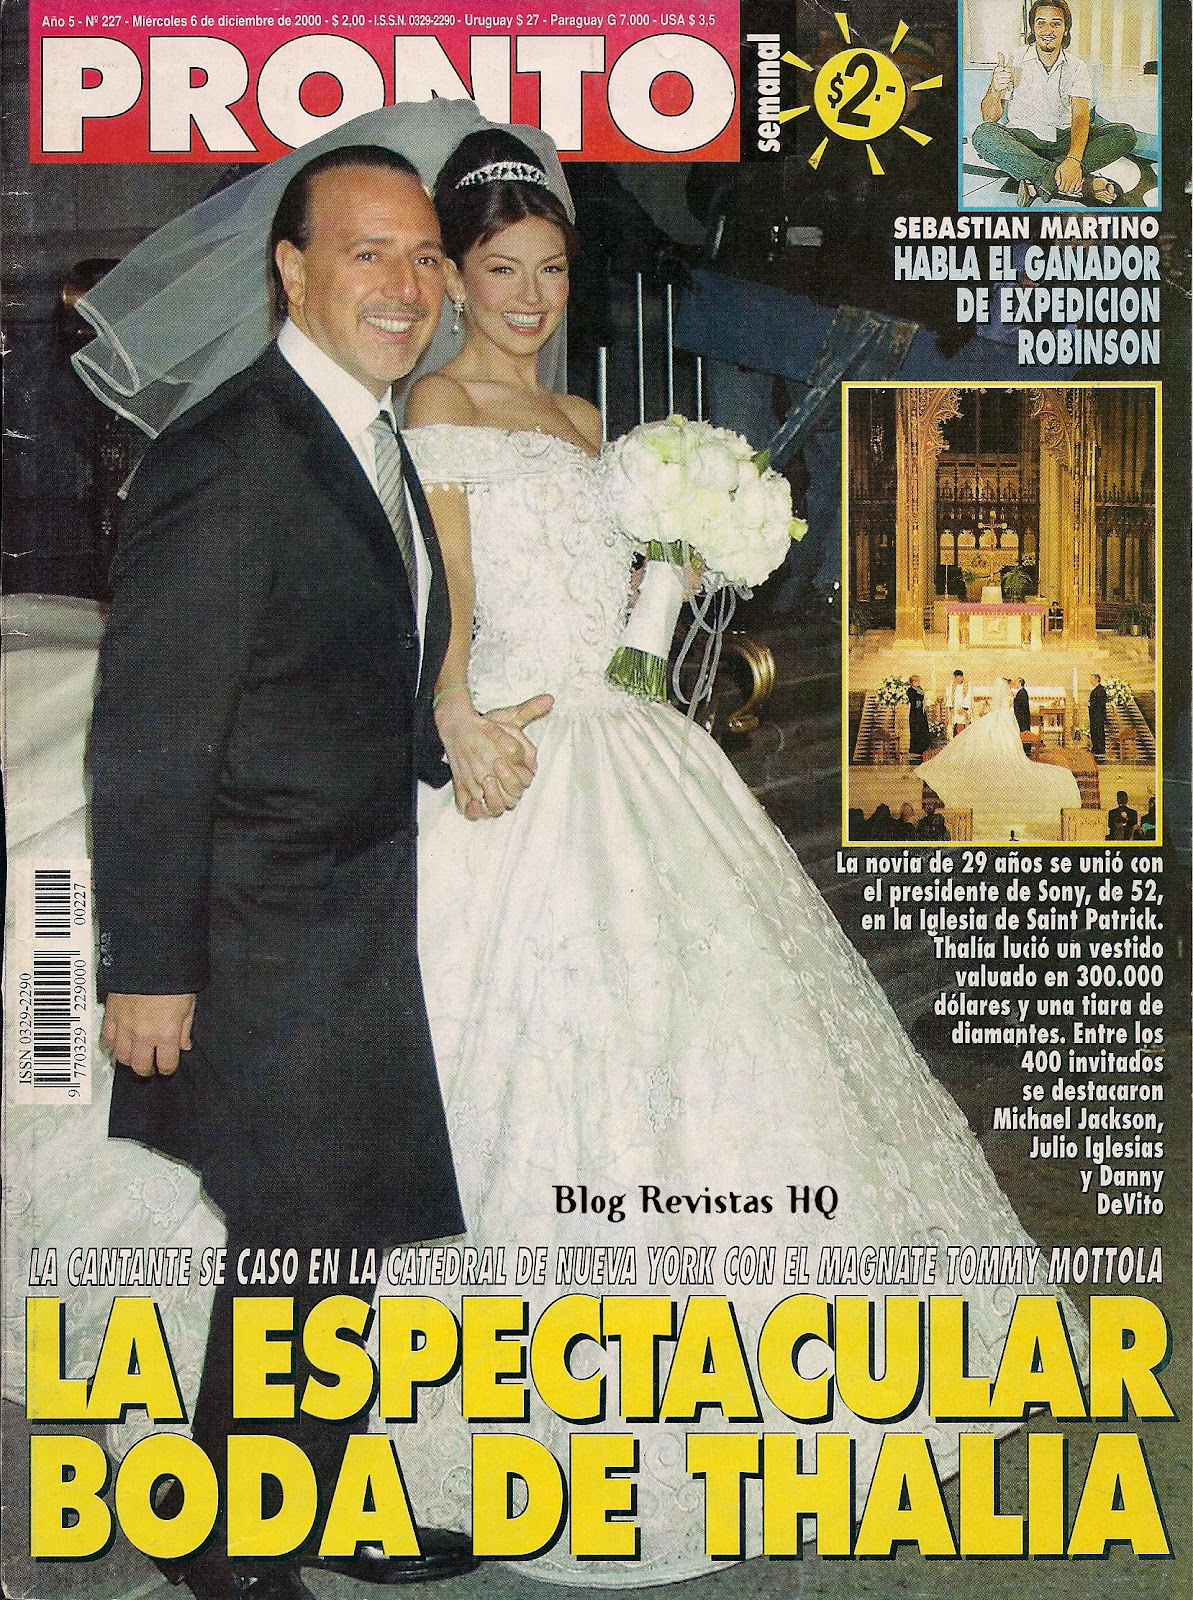 Thalia Revistas Hq Pronto 2000 Boda